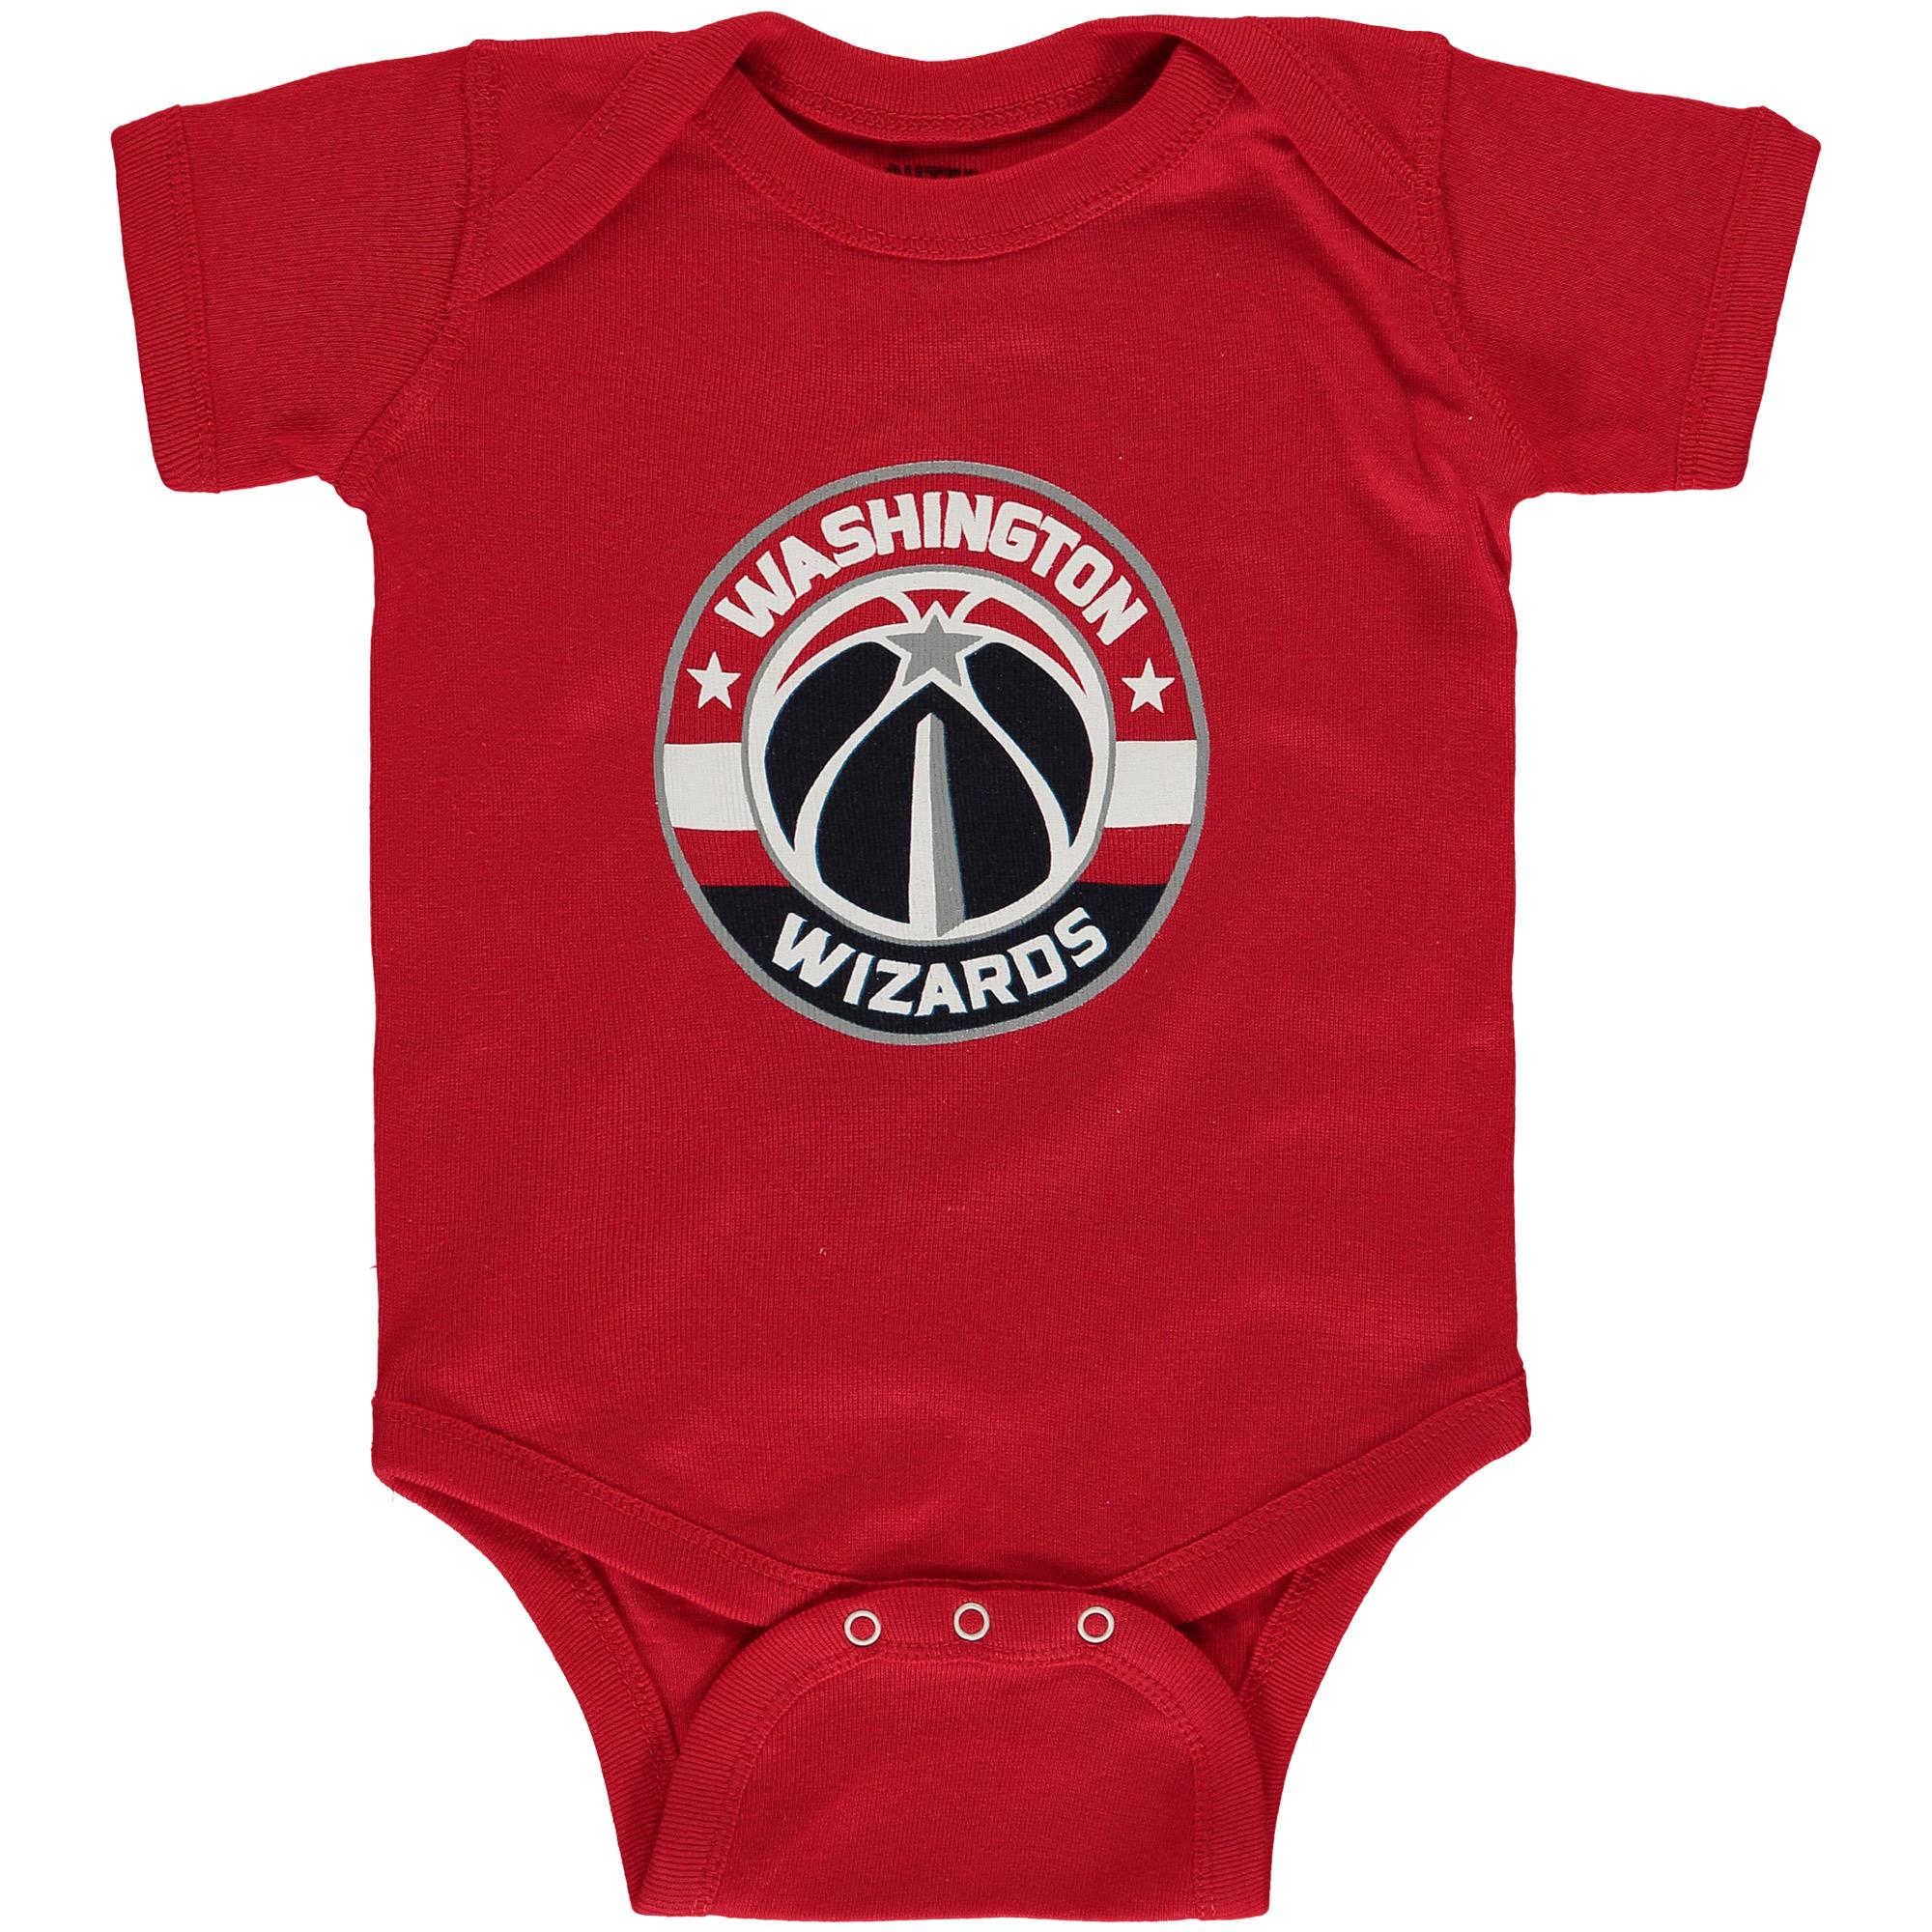 Washington Wizards Nike Newborn & Infant Primary Logo Bodysuit - Red